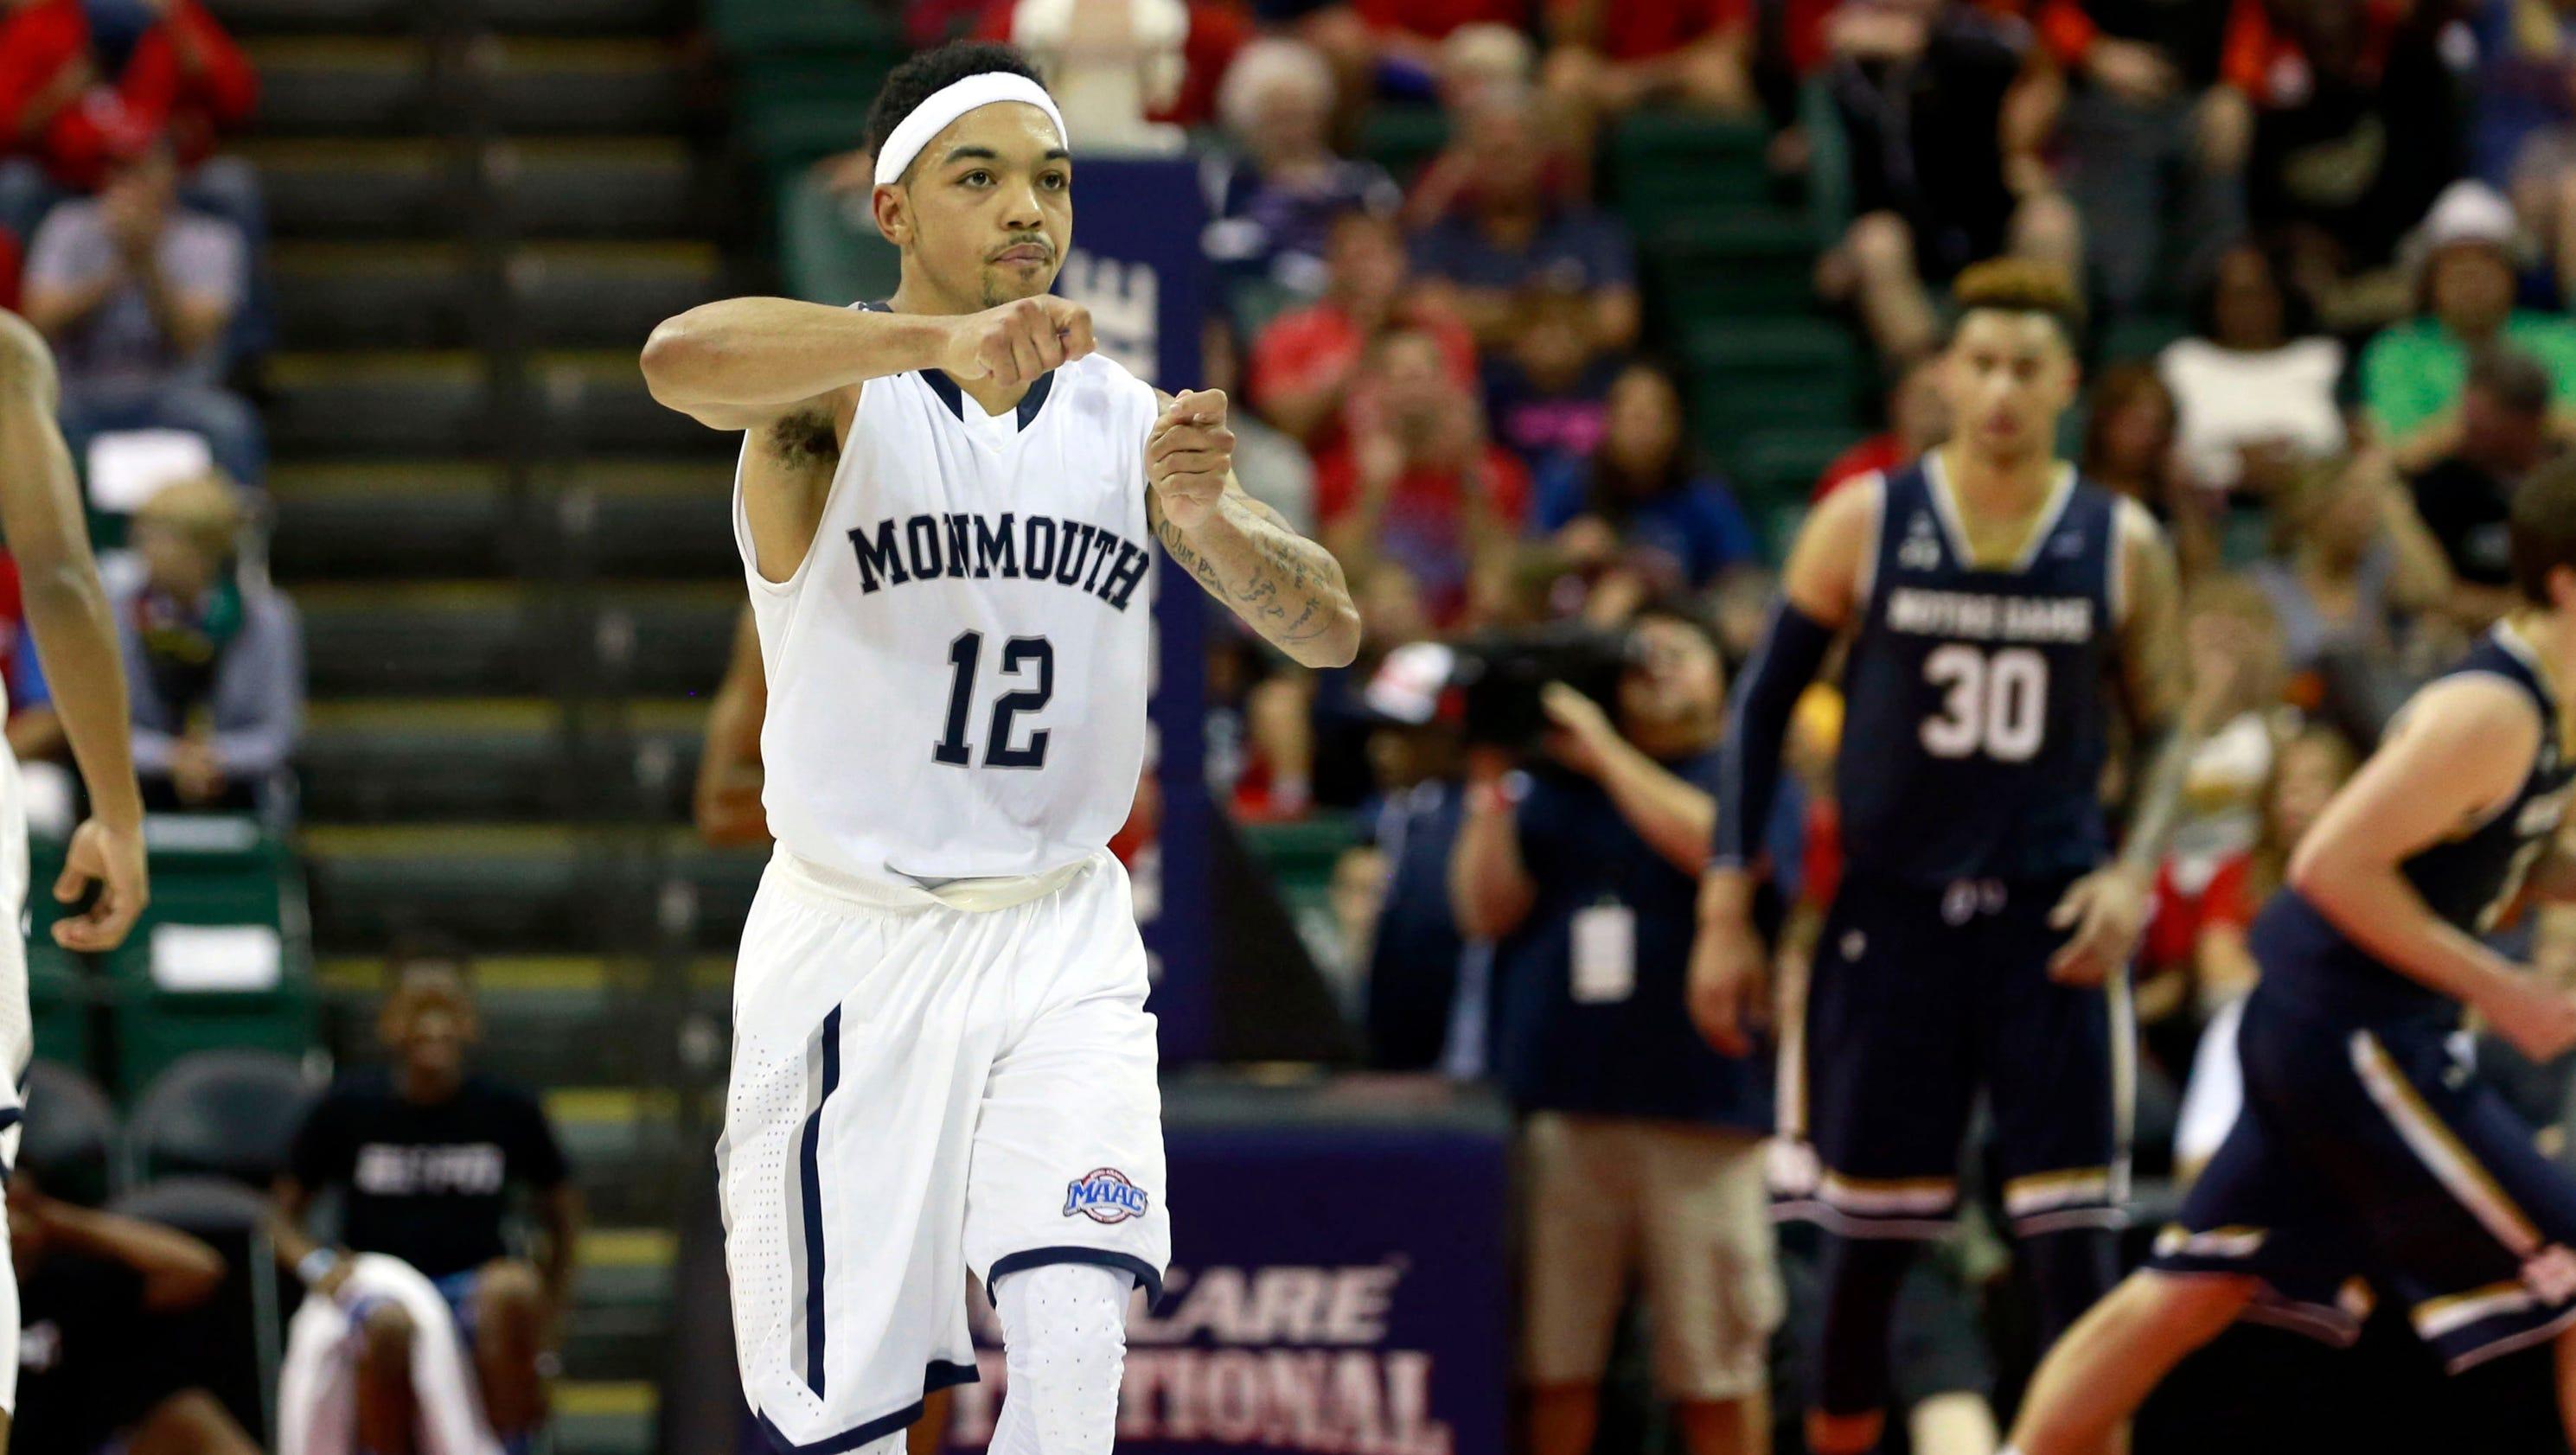 Monmouth's 5-8 guard Justin Robinson makes big impression